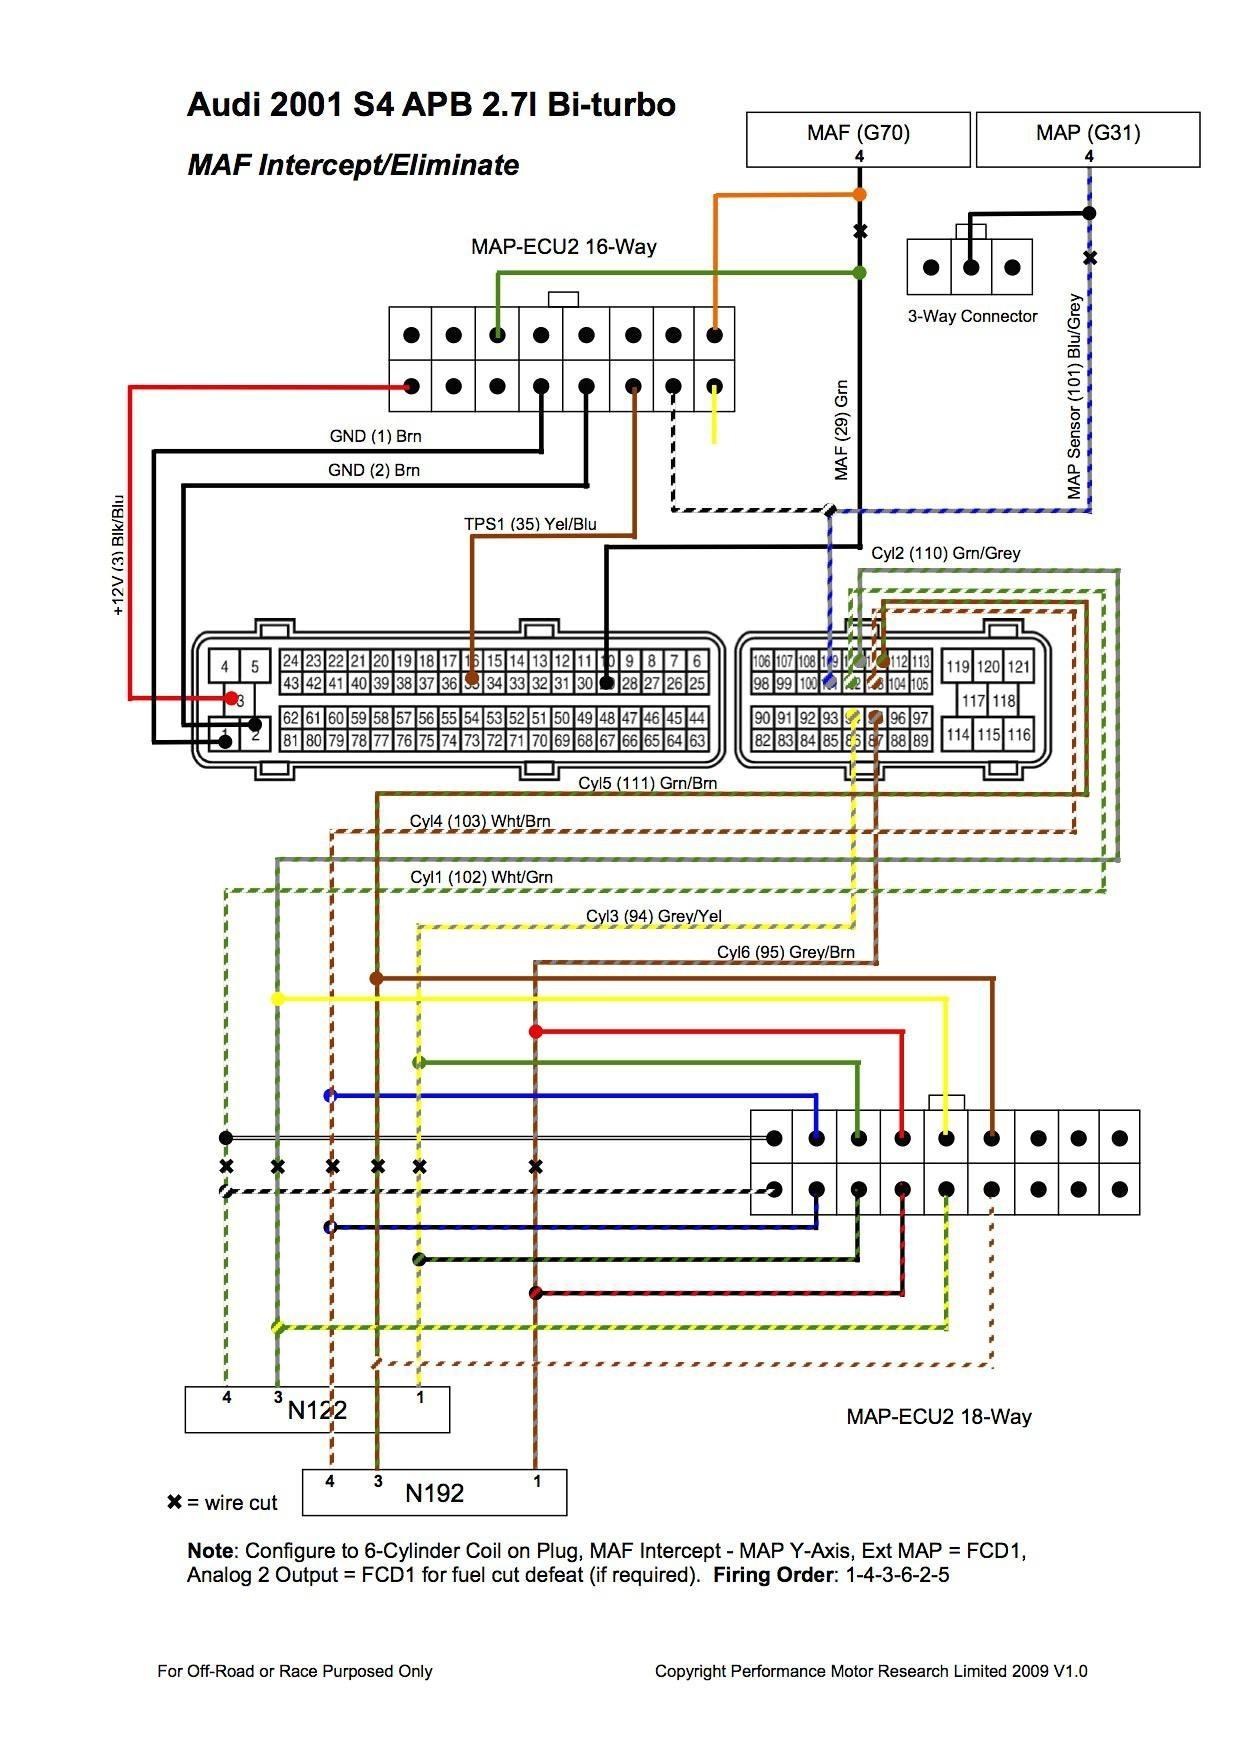 Best 2005 Dodge Ram 1500 Infinity Wiring Diagram